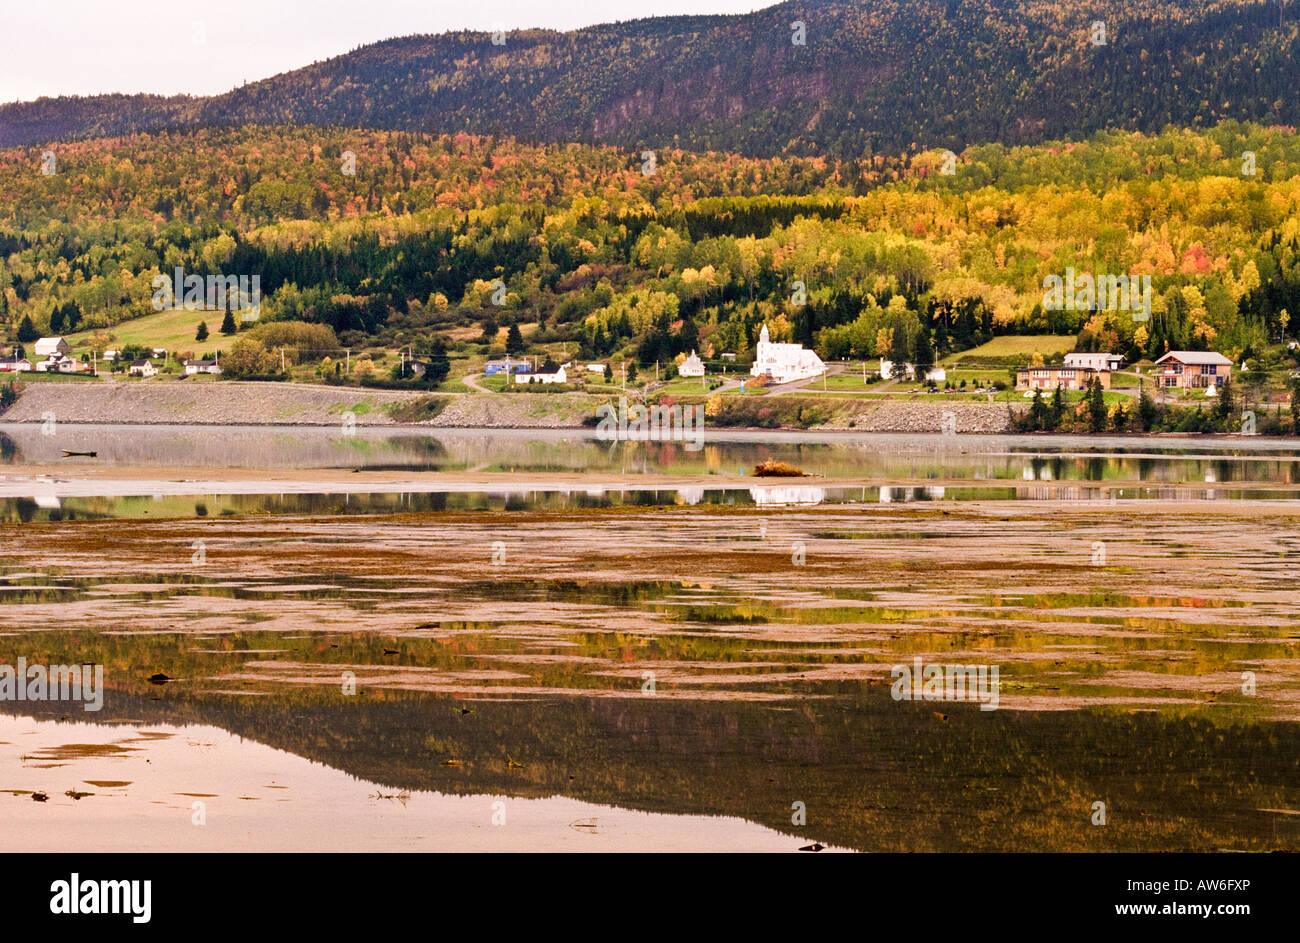 Pointe Navarre, Gaspe Peninsula, Quebec, Canada - Stock Image